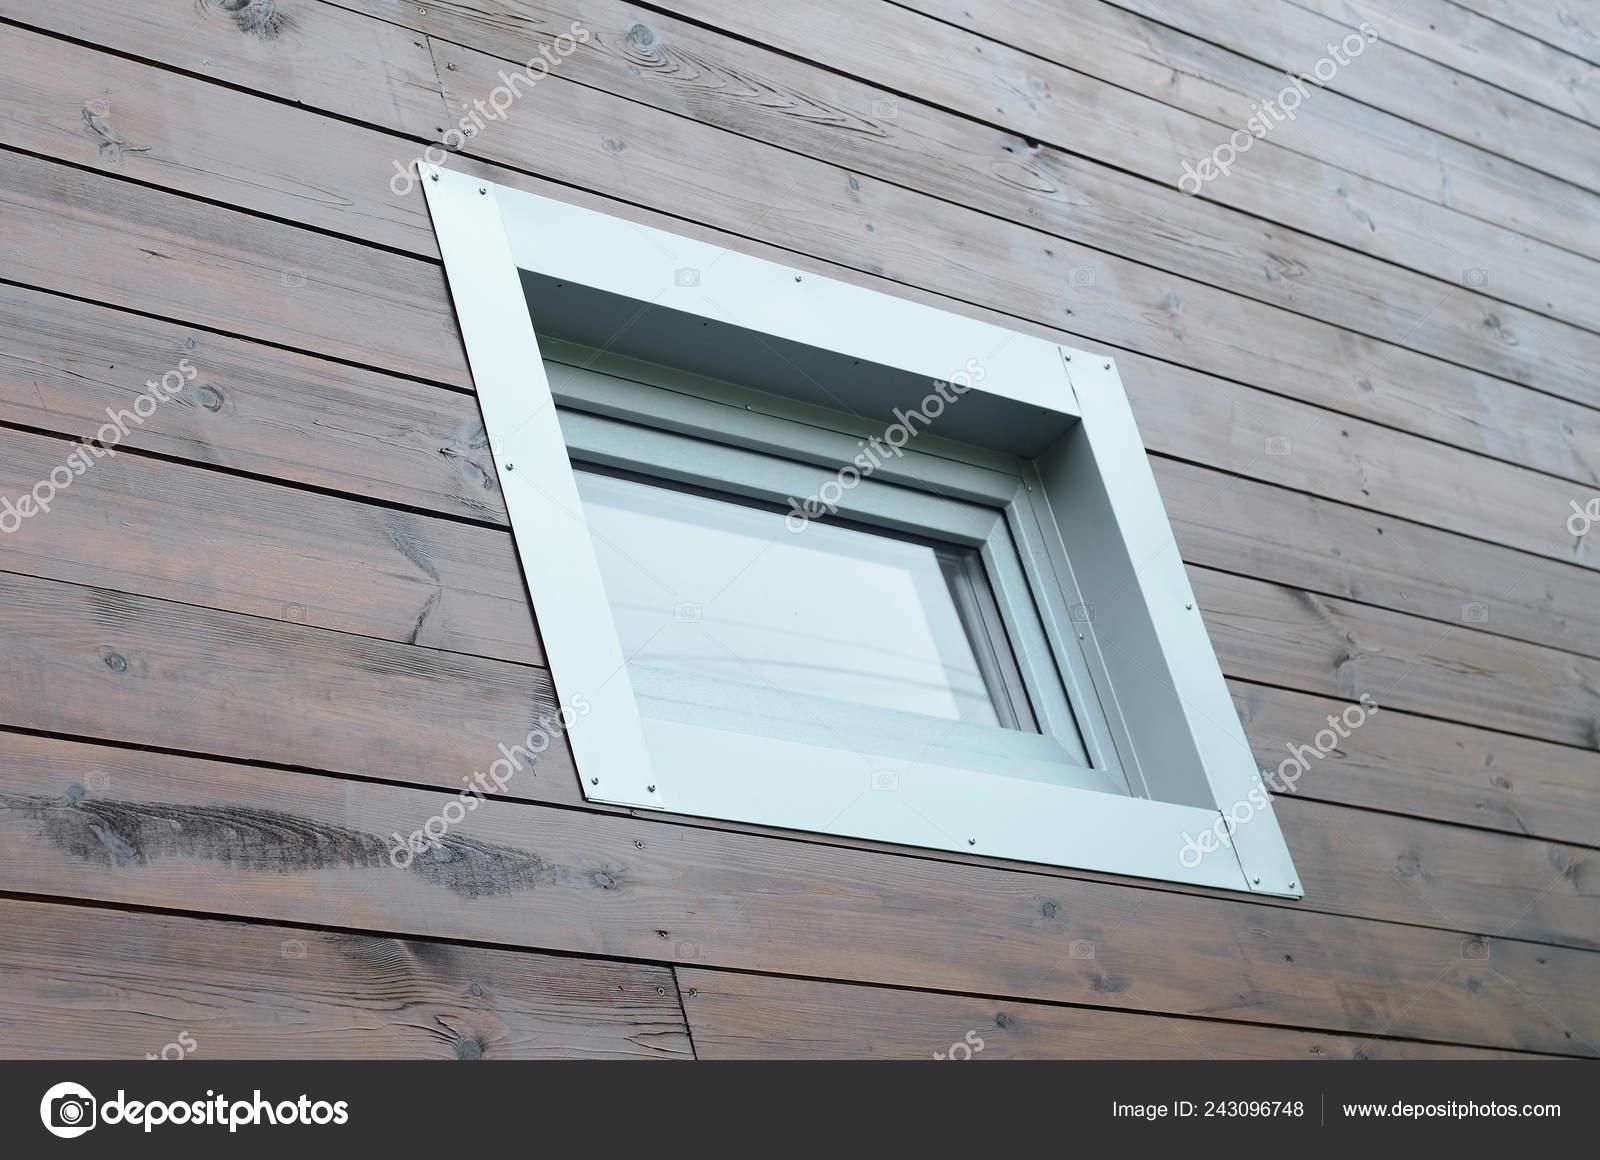 Ventanas Pvc Stock.Plastic Pvc Window Modern Passive Wooden House Facade Wall